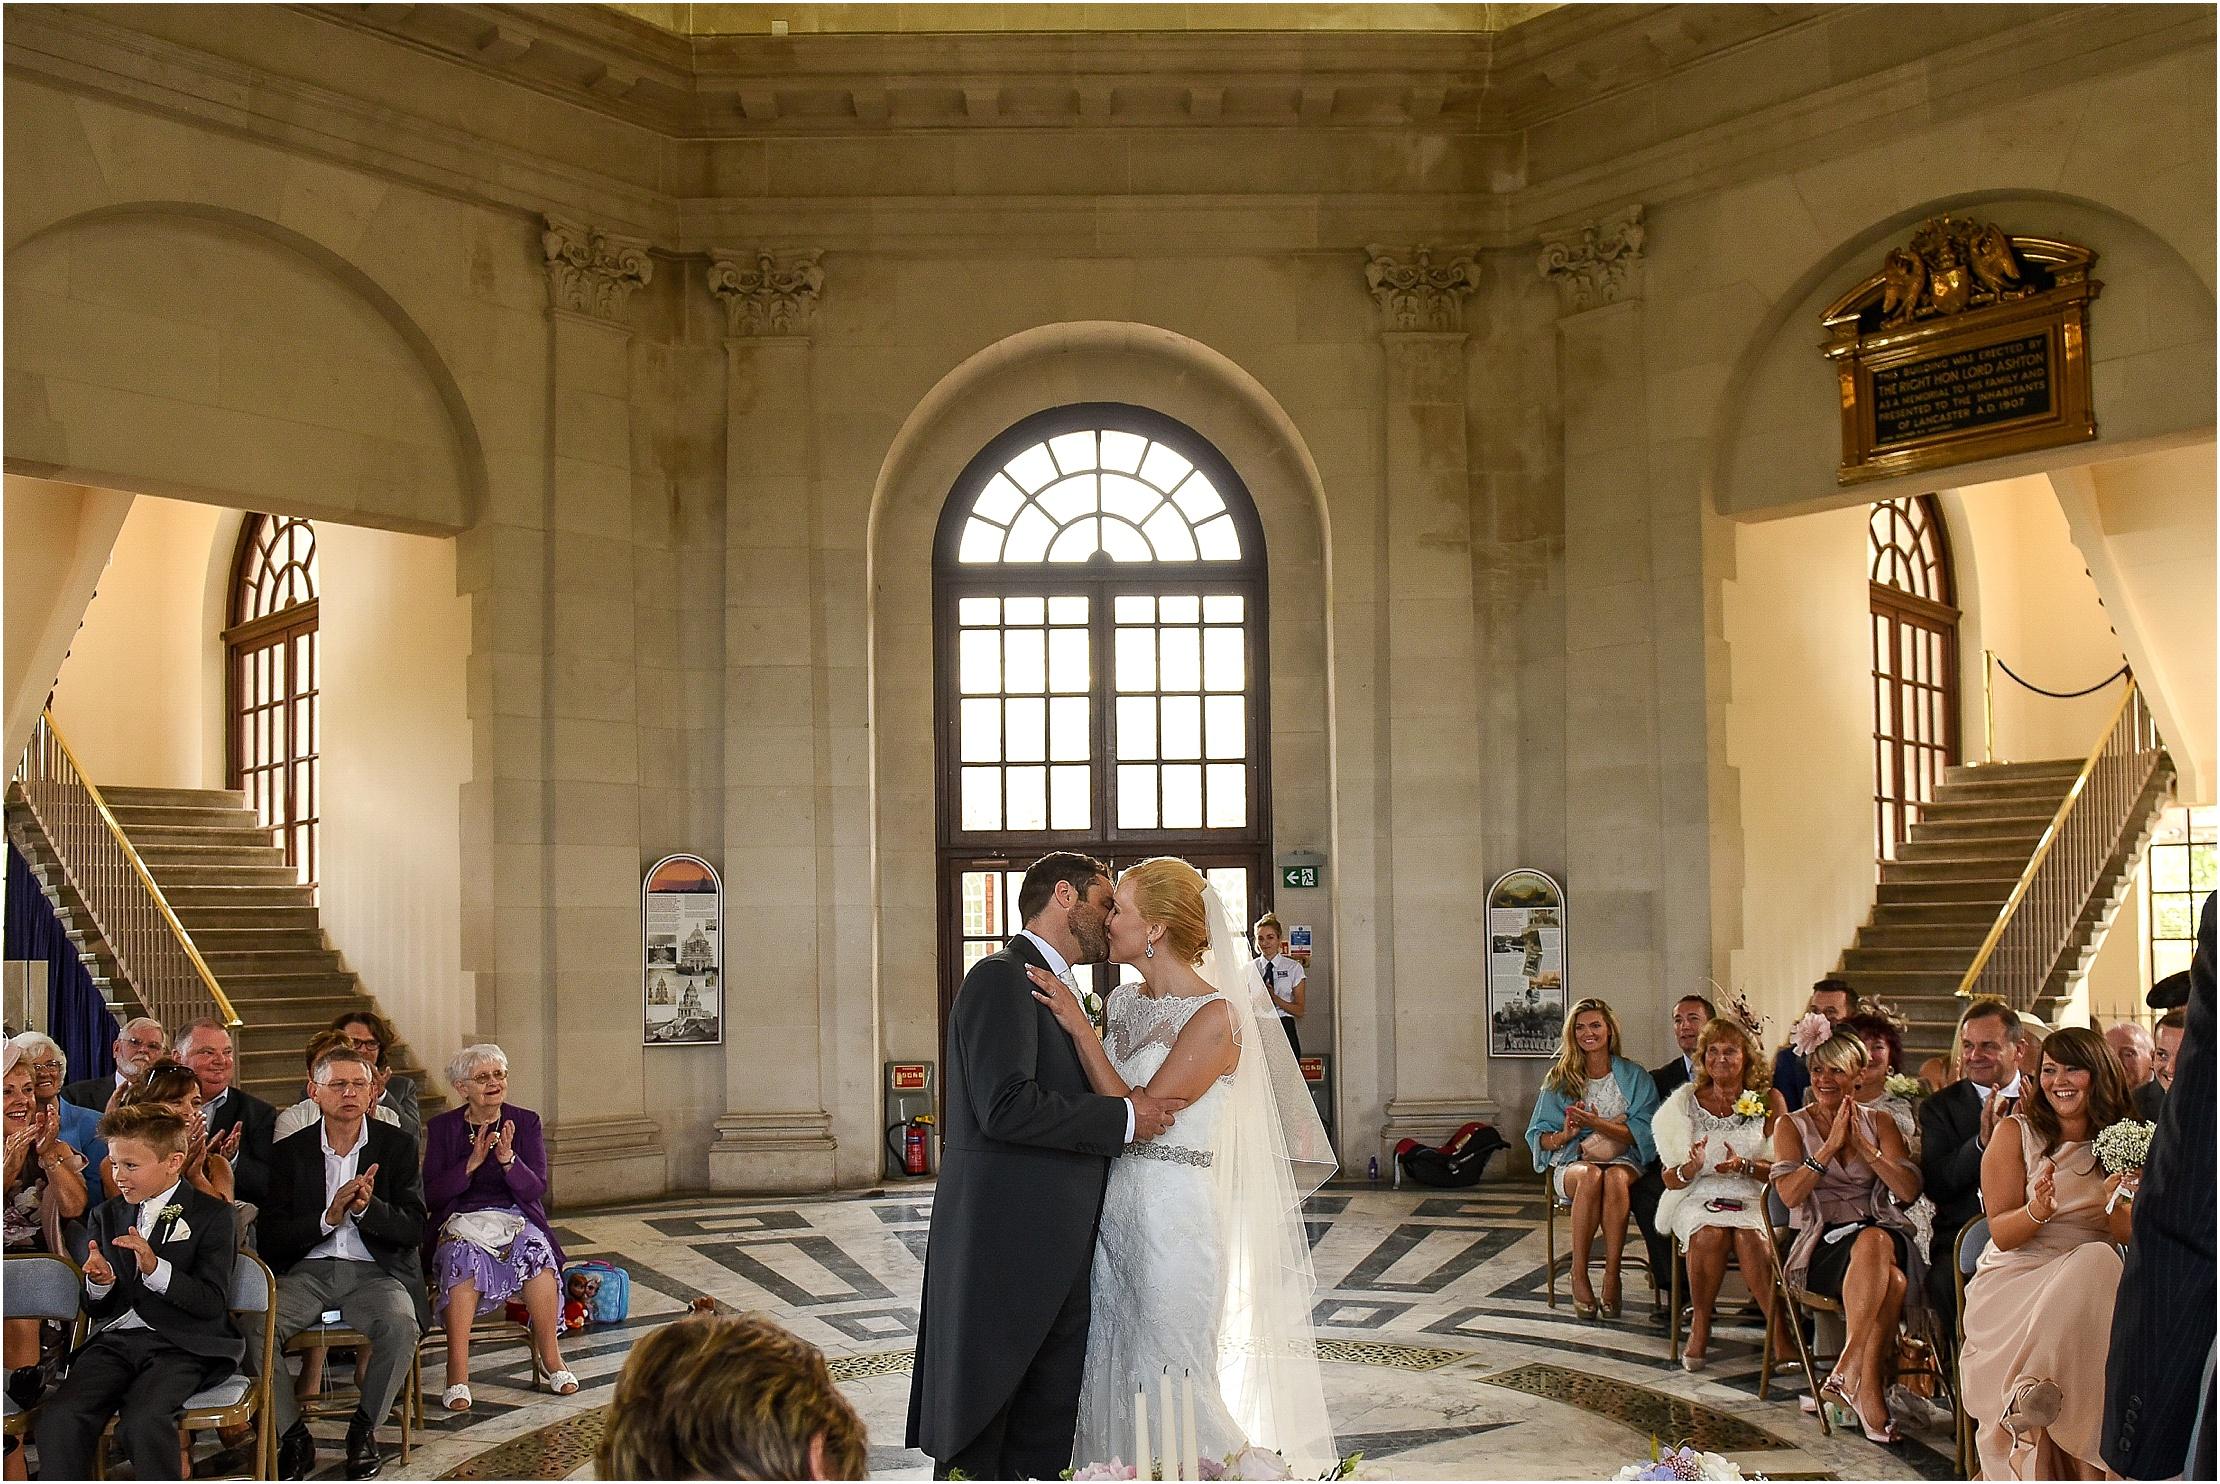 staining-lodge-wedding-068.jpg